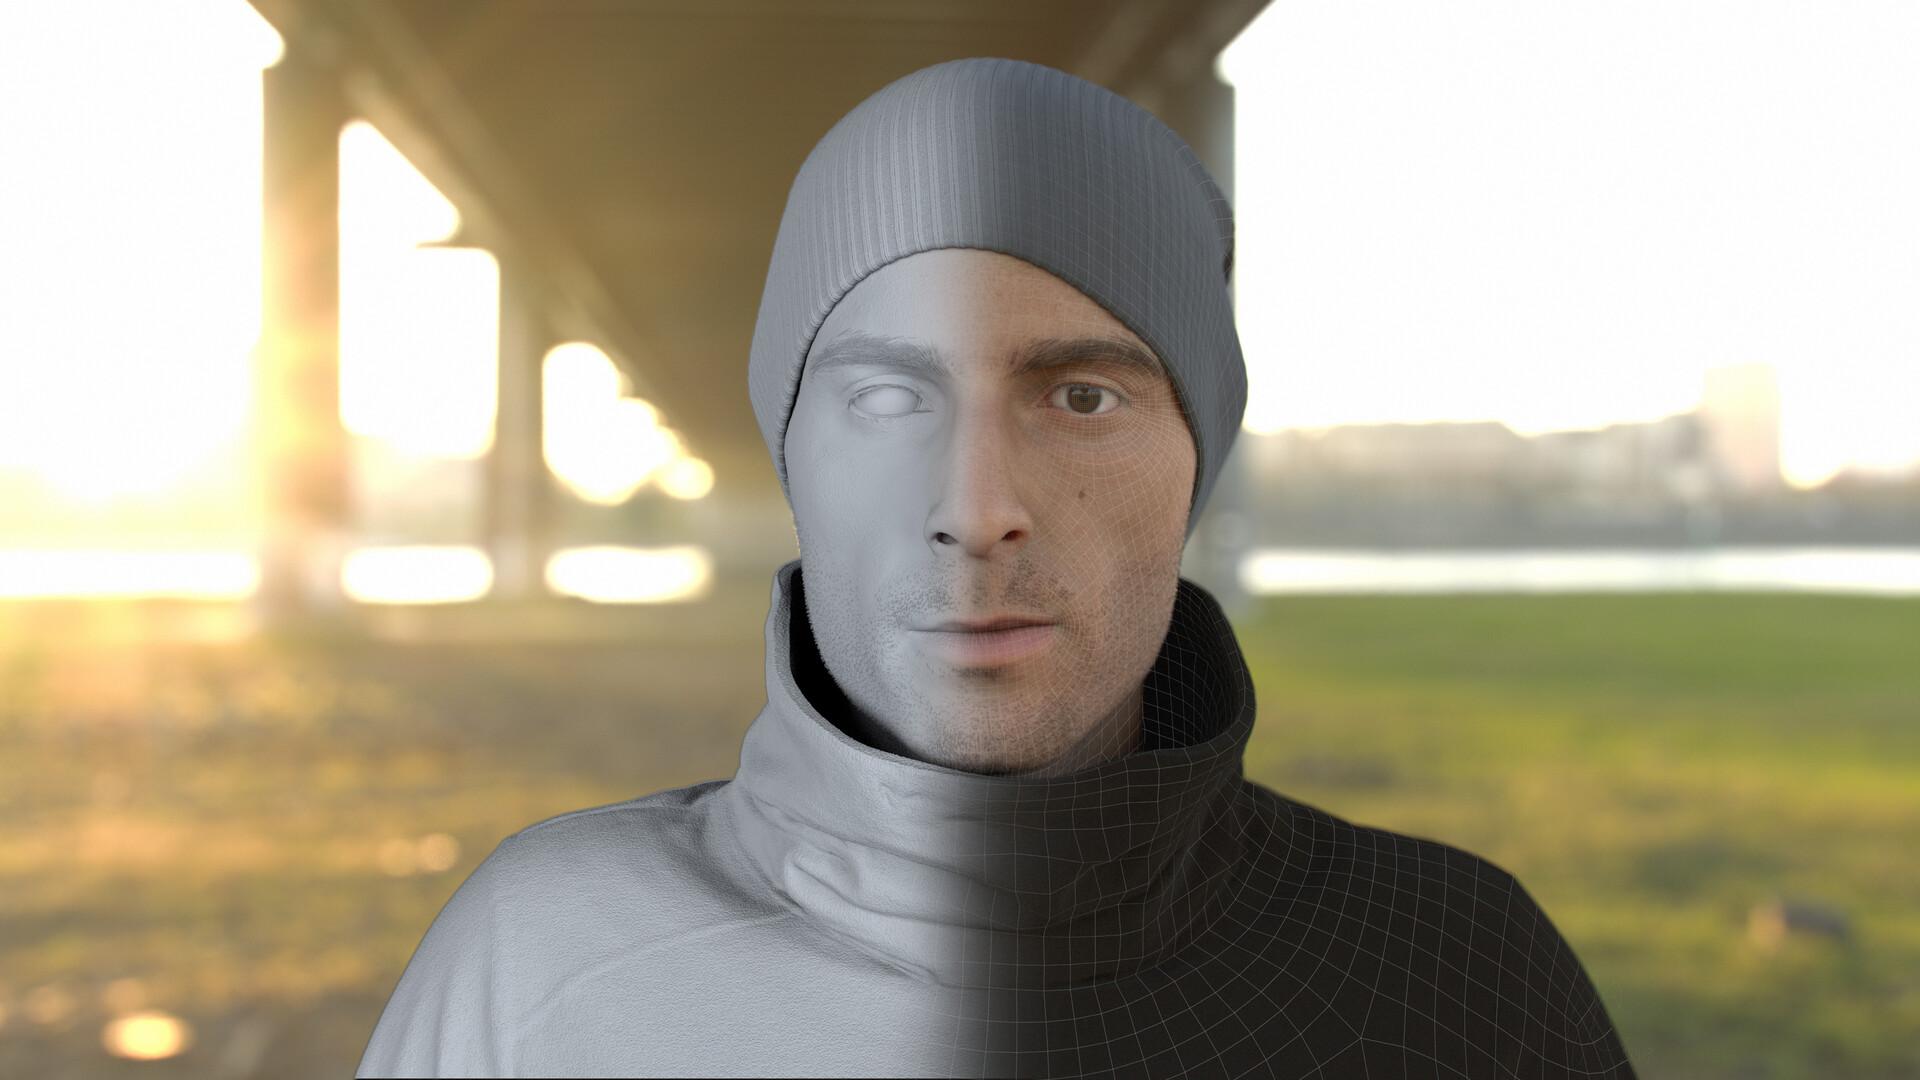 Jason colthrust digitalportrait3 2 by jasoncolthrust wire